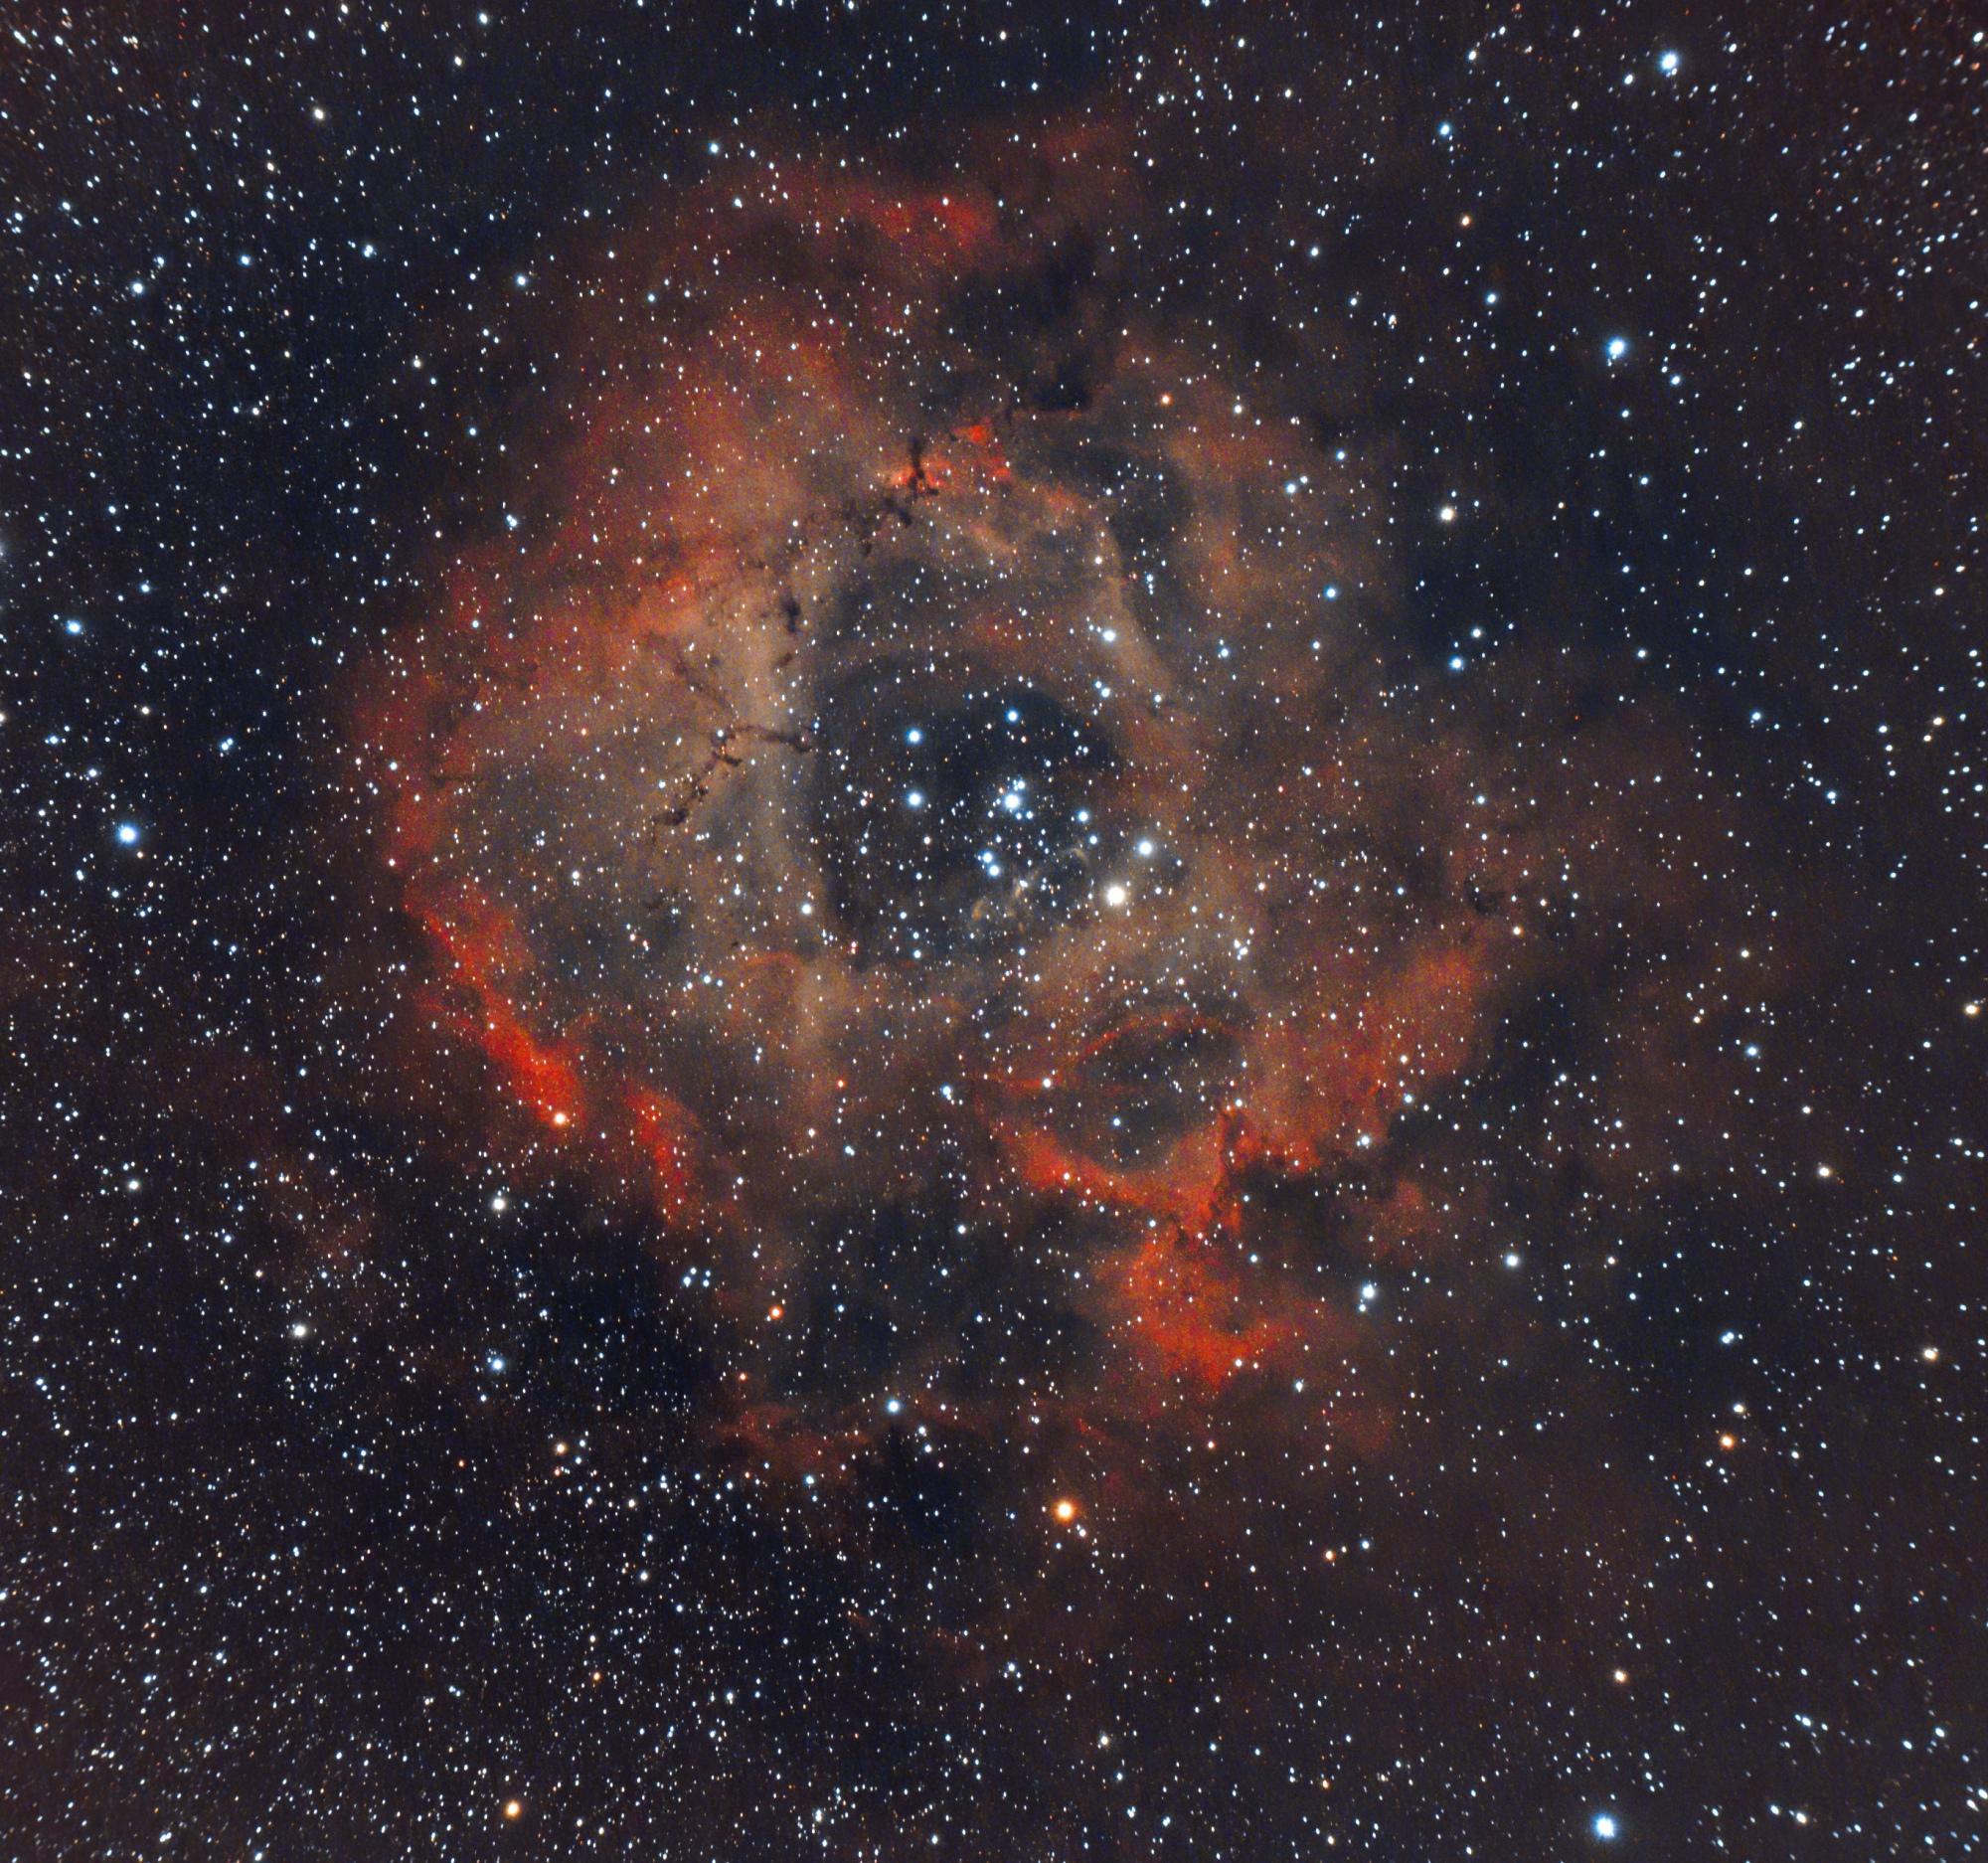 6042a668c45e5_NGC2246web.thumb.jpg.00cb35b91df0640efb7c8ce4b5d52f69.jpg